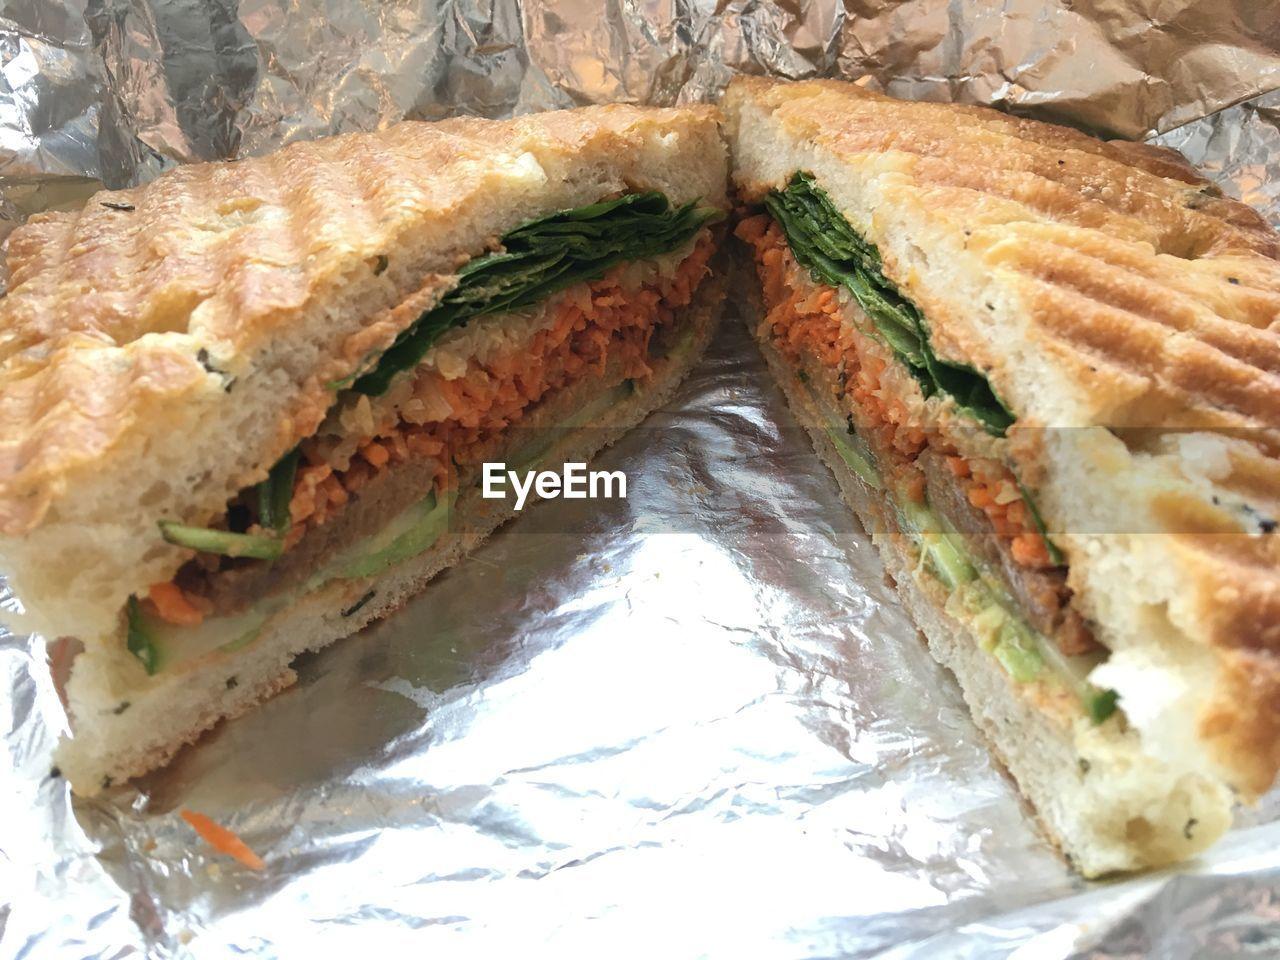 Close-Up Of Sliced Sandwich On Foil